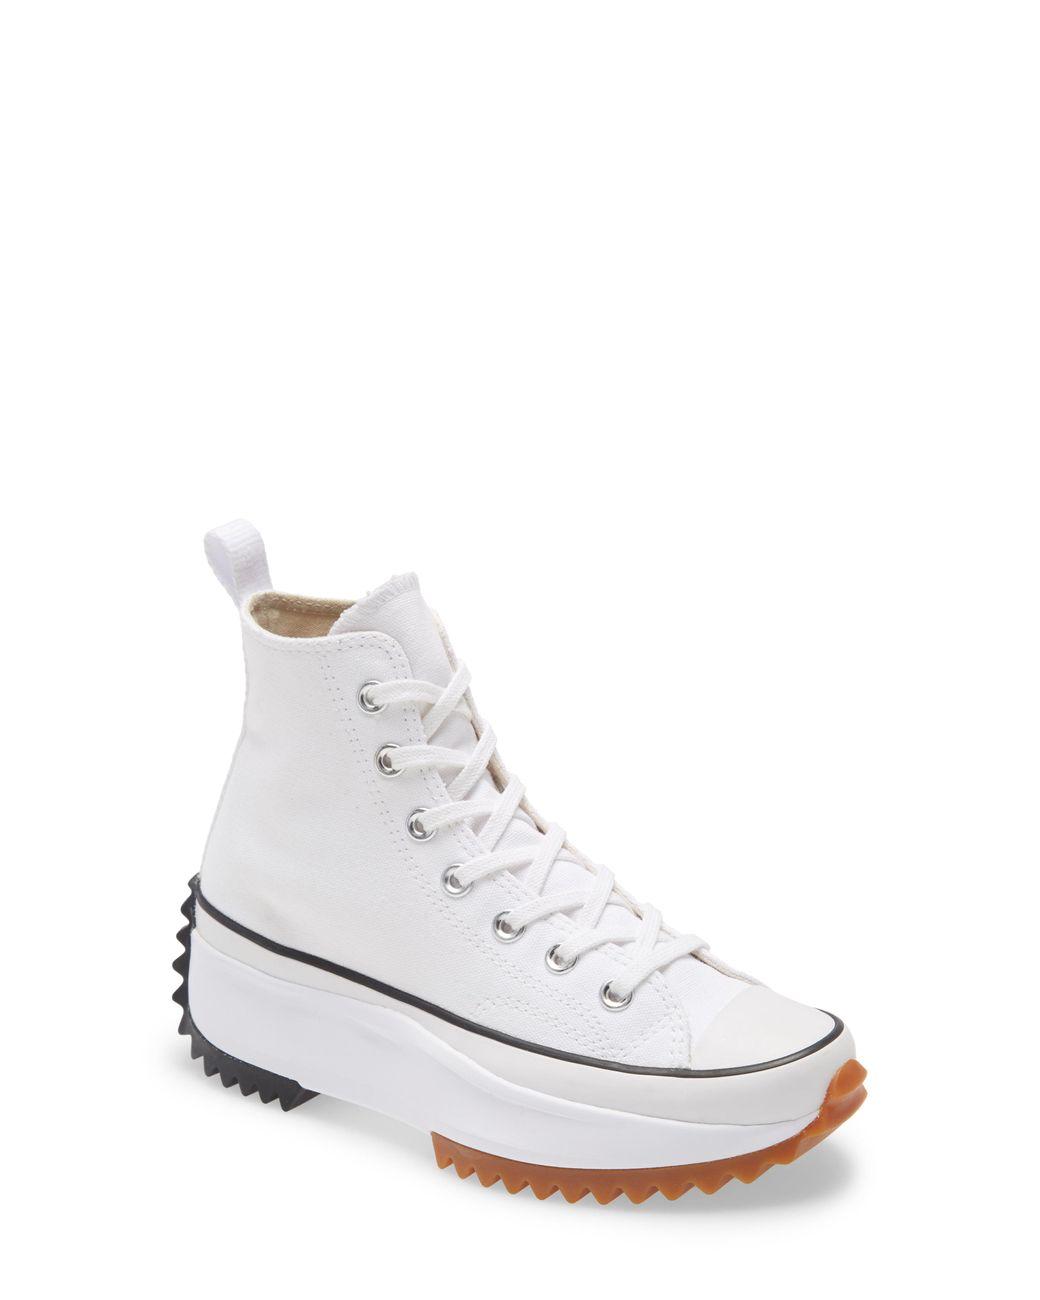 white platform sneakers high top